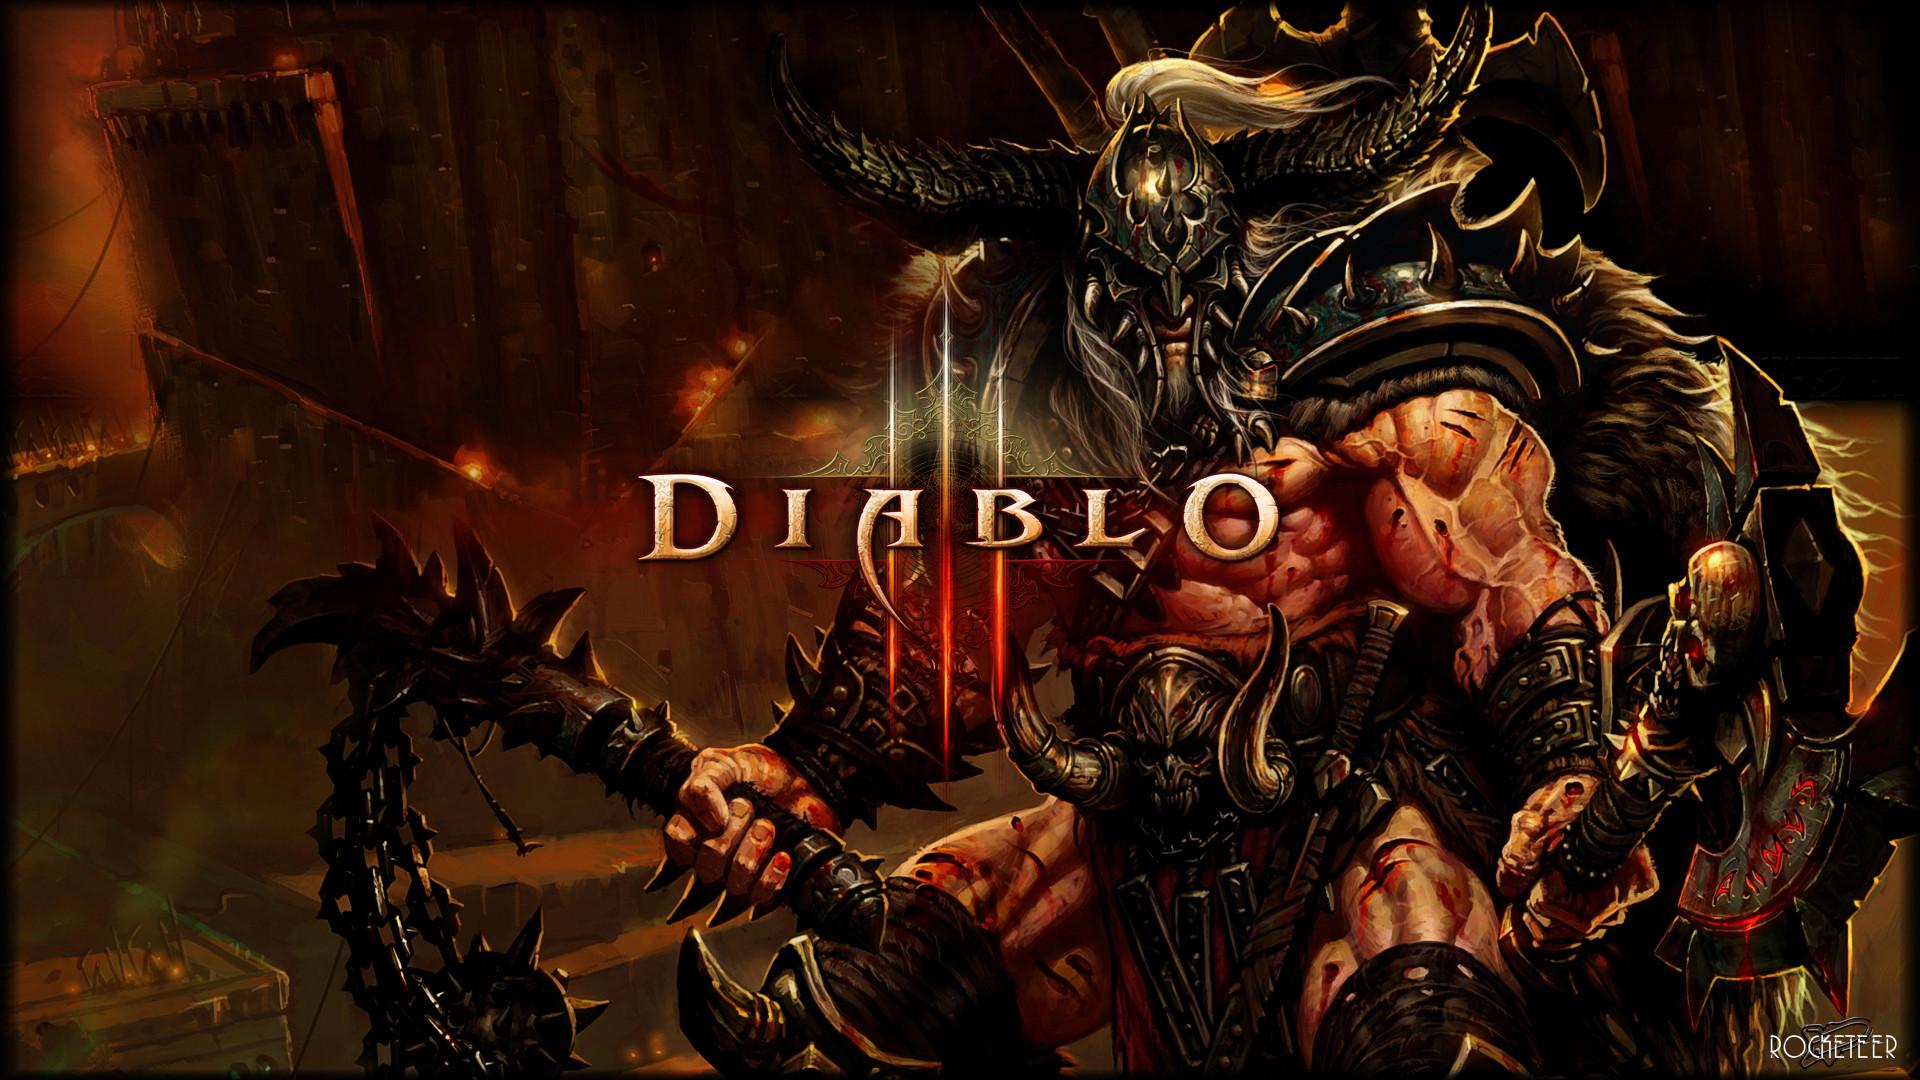 Diablo 3 Game HD Wallpapers